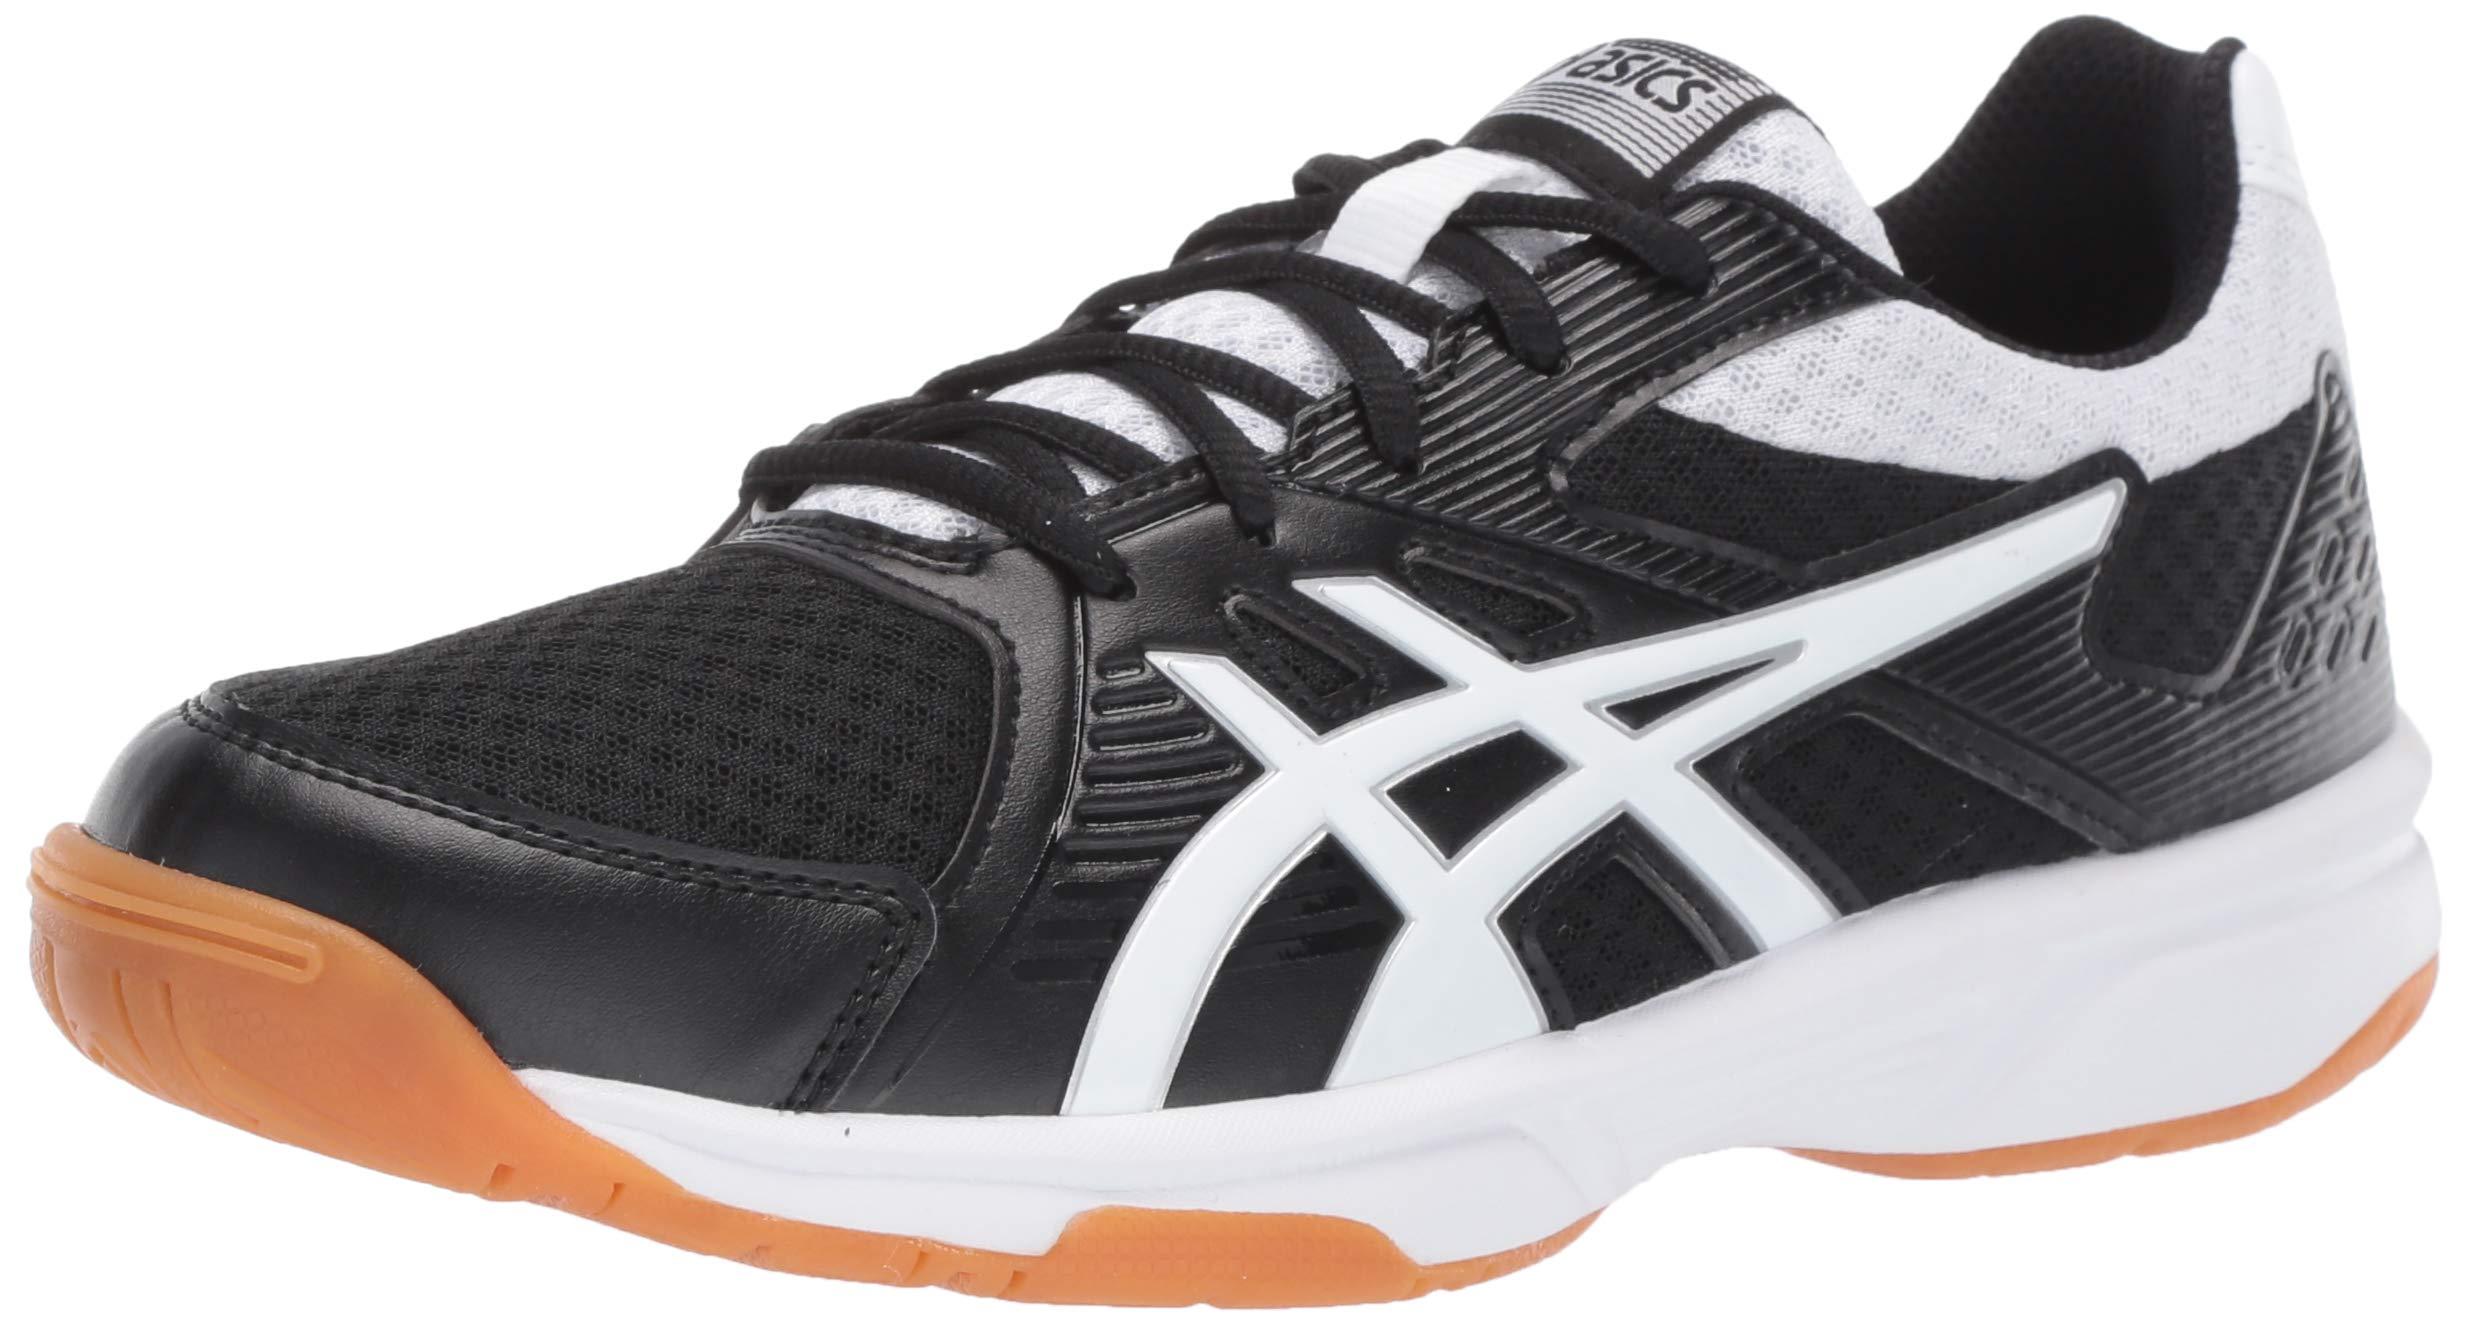 ASICS Upcourt 3 Women's Volleyball Shoe, Black/White, 8 M US by ASICS